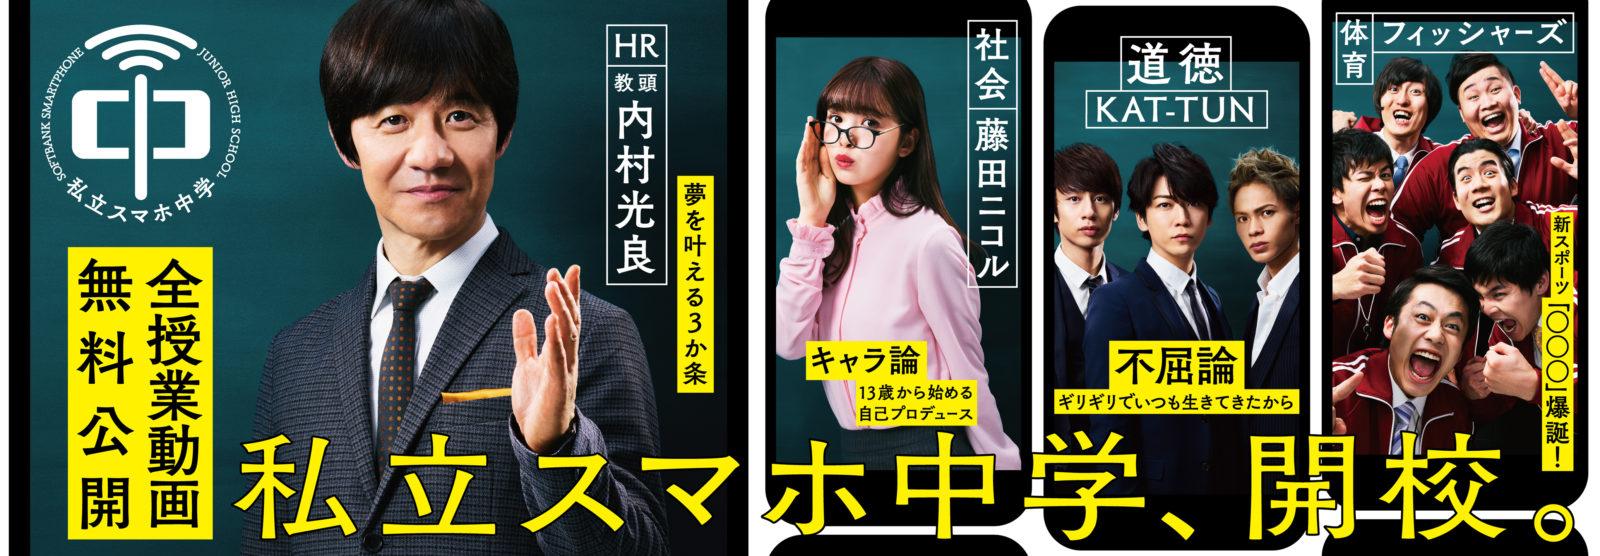 KAT-TUNが講師になり道徳の授業を開講 ファンは「絶対通う」「何度夢見たことか」と喜びサムネイル画像!